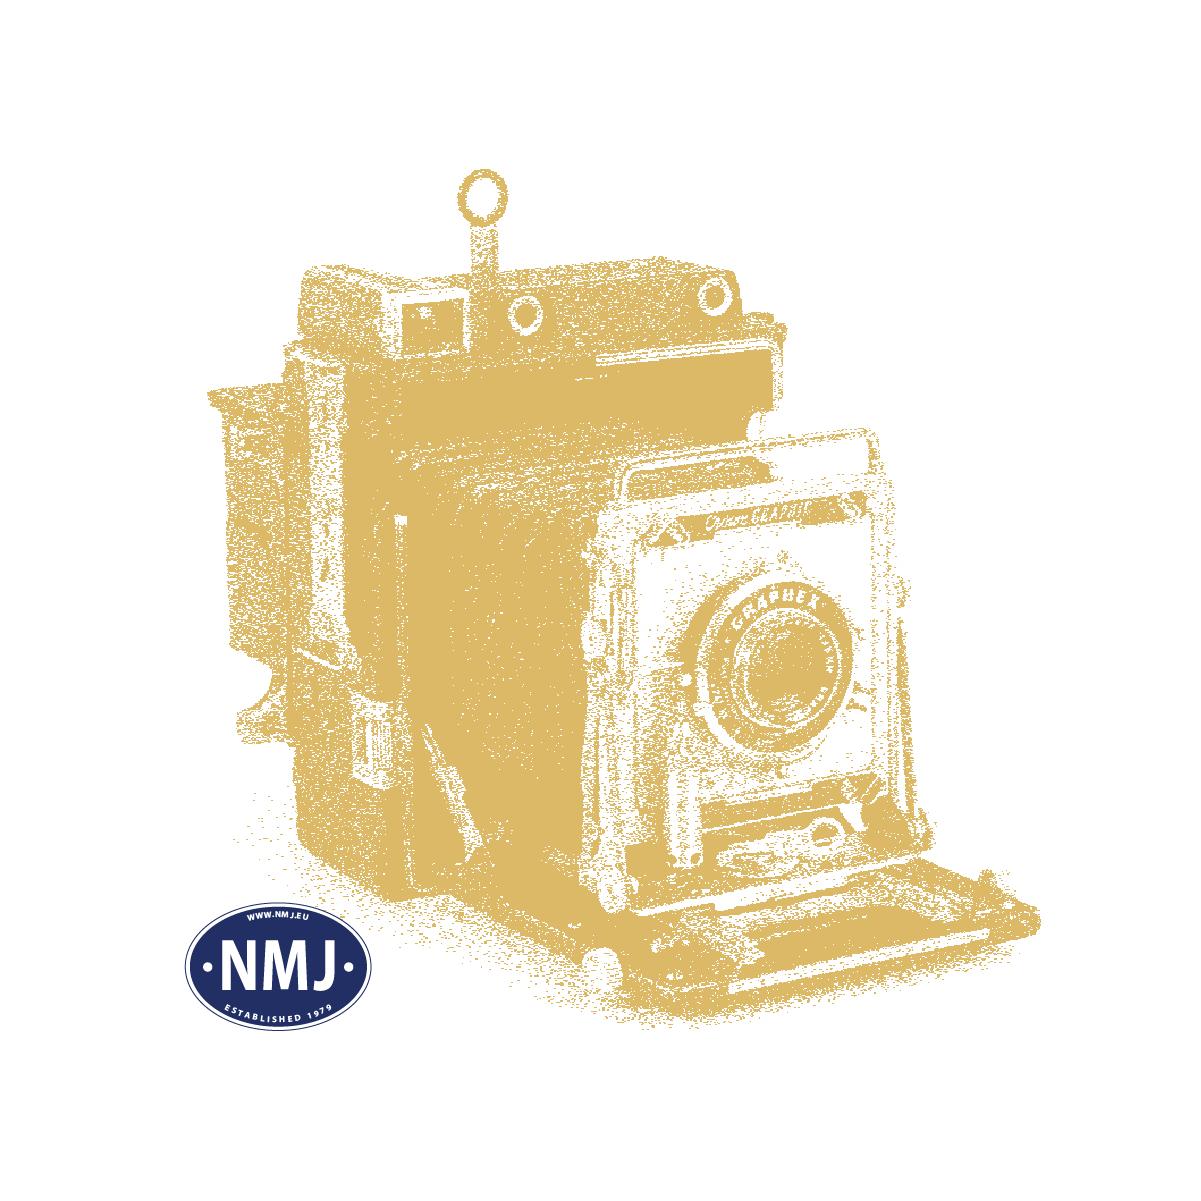 NMJSE2.1122 - NMJ Superline SJ E2.1122